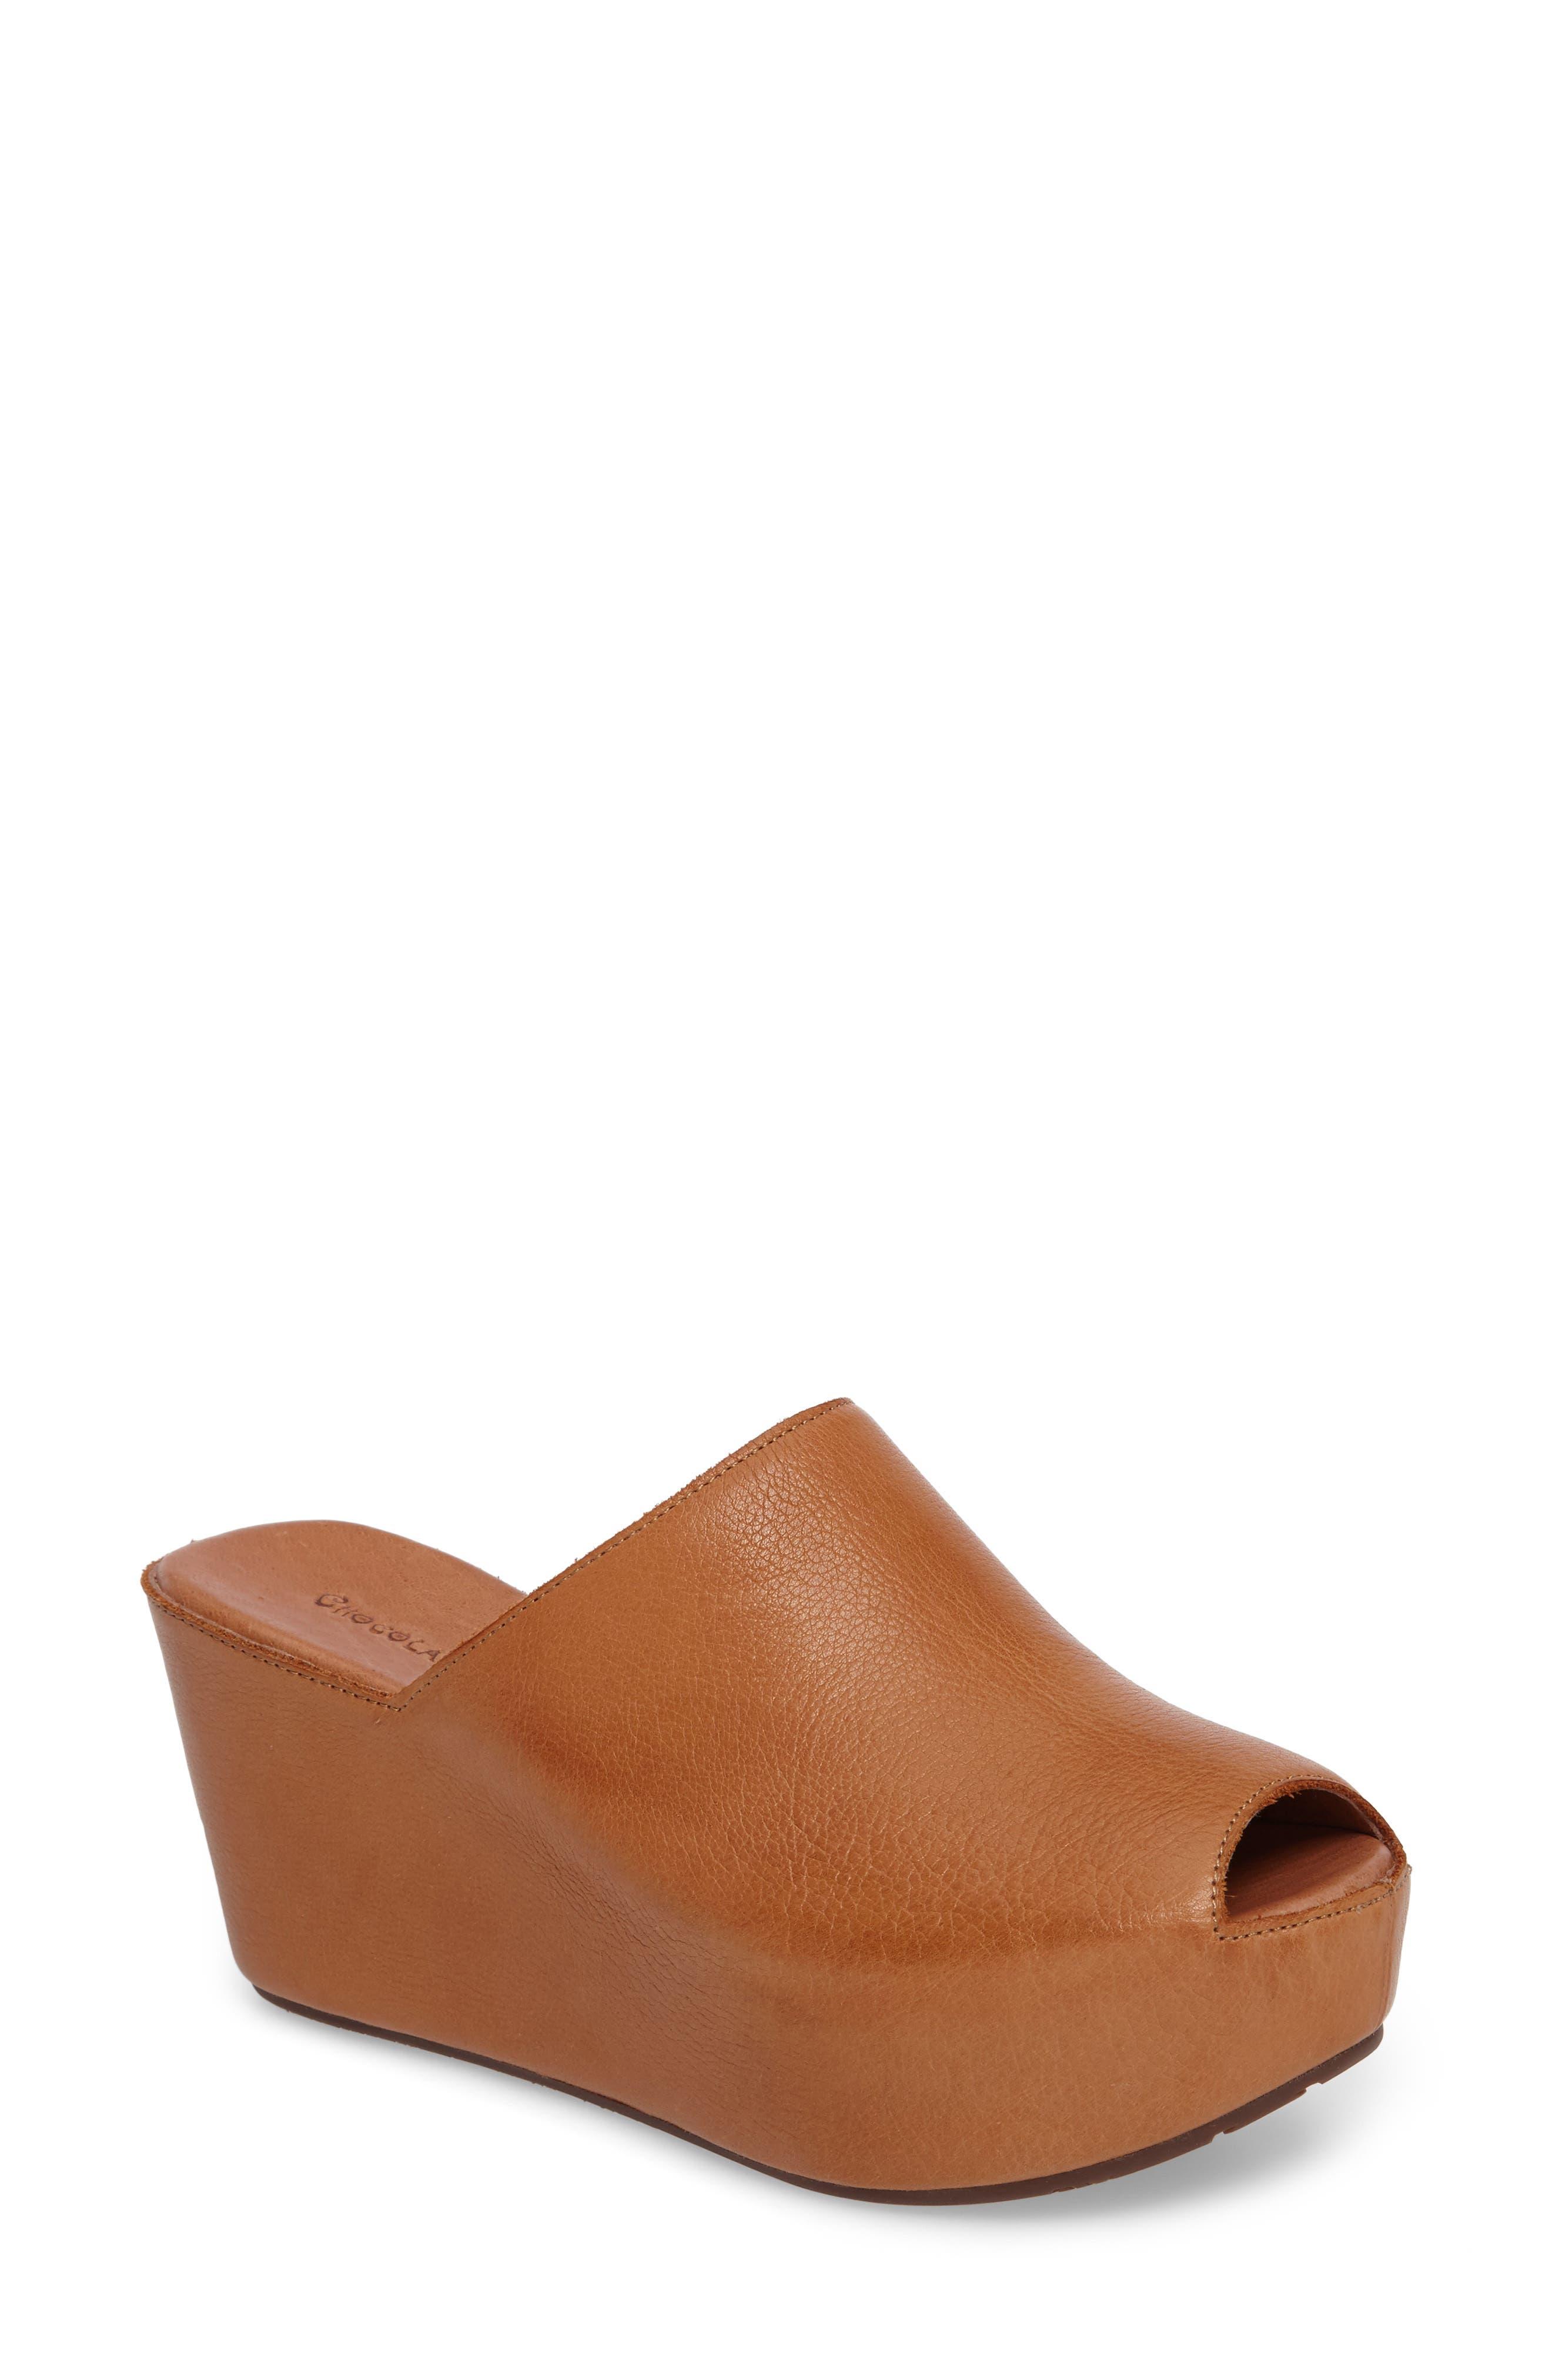 Willa Platform Wedge Mule,                         Main,                         color, Camel Leather